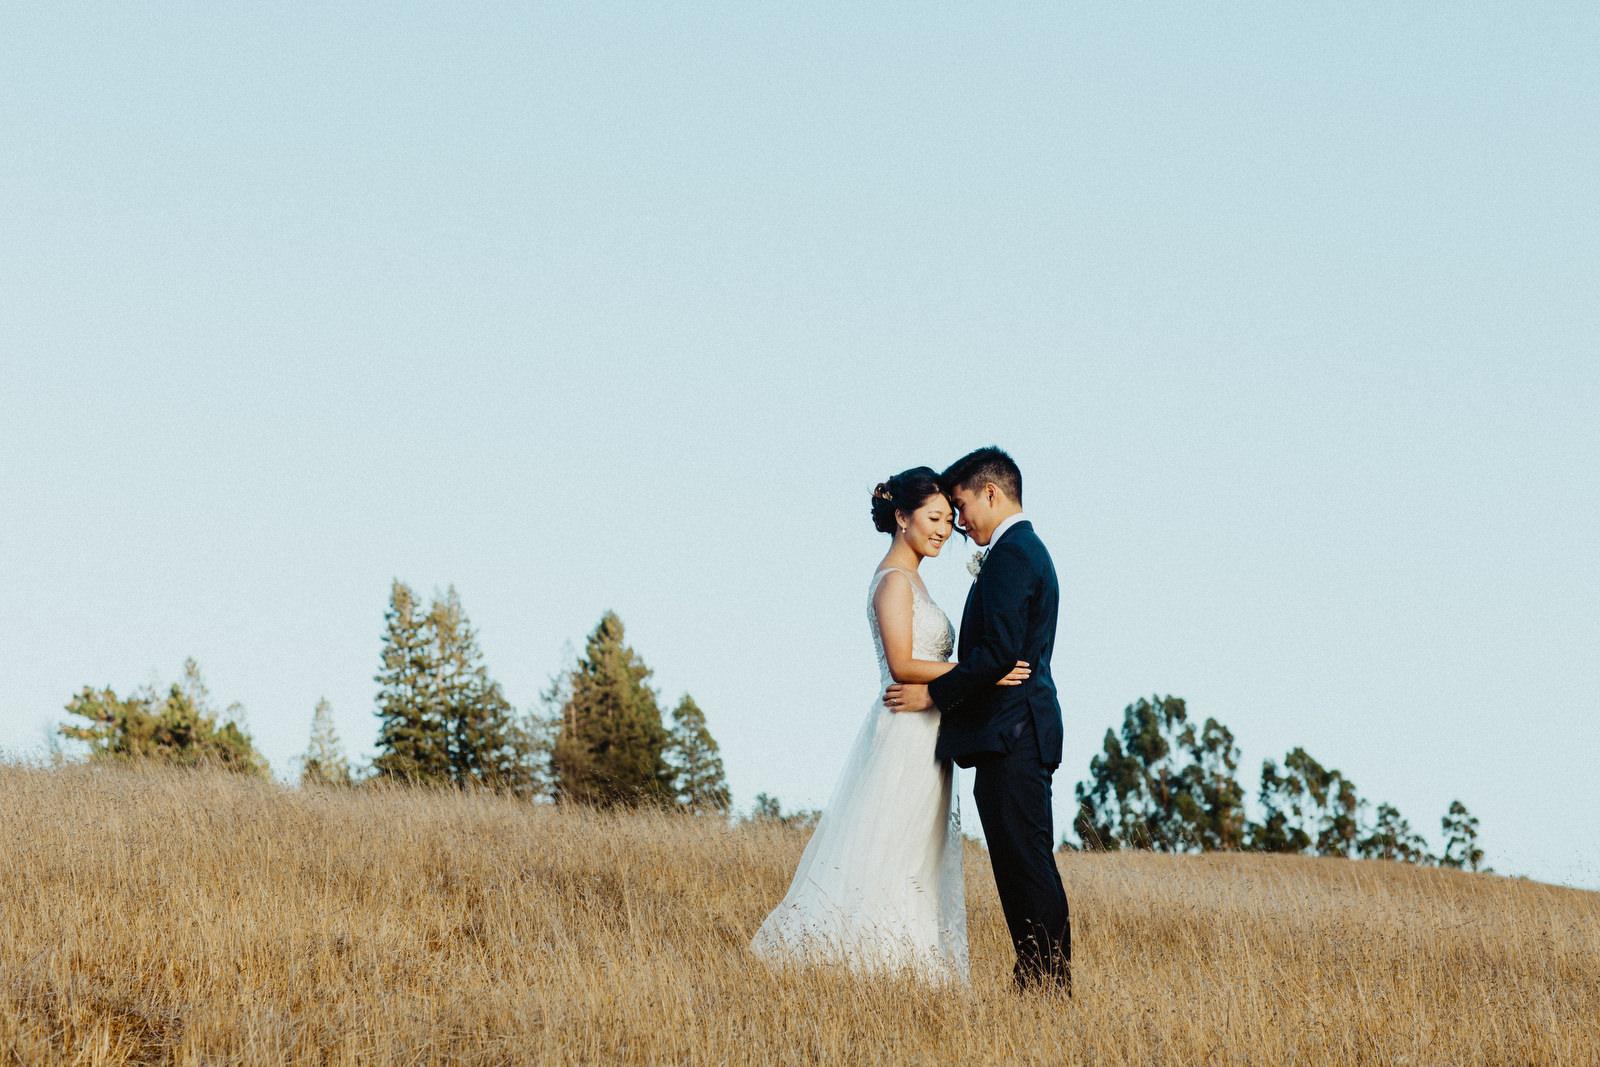 Sally&Jason Palo Alto Wedding67.JPG